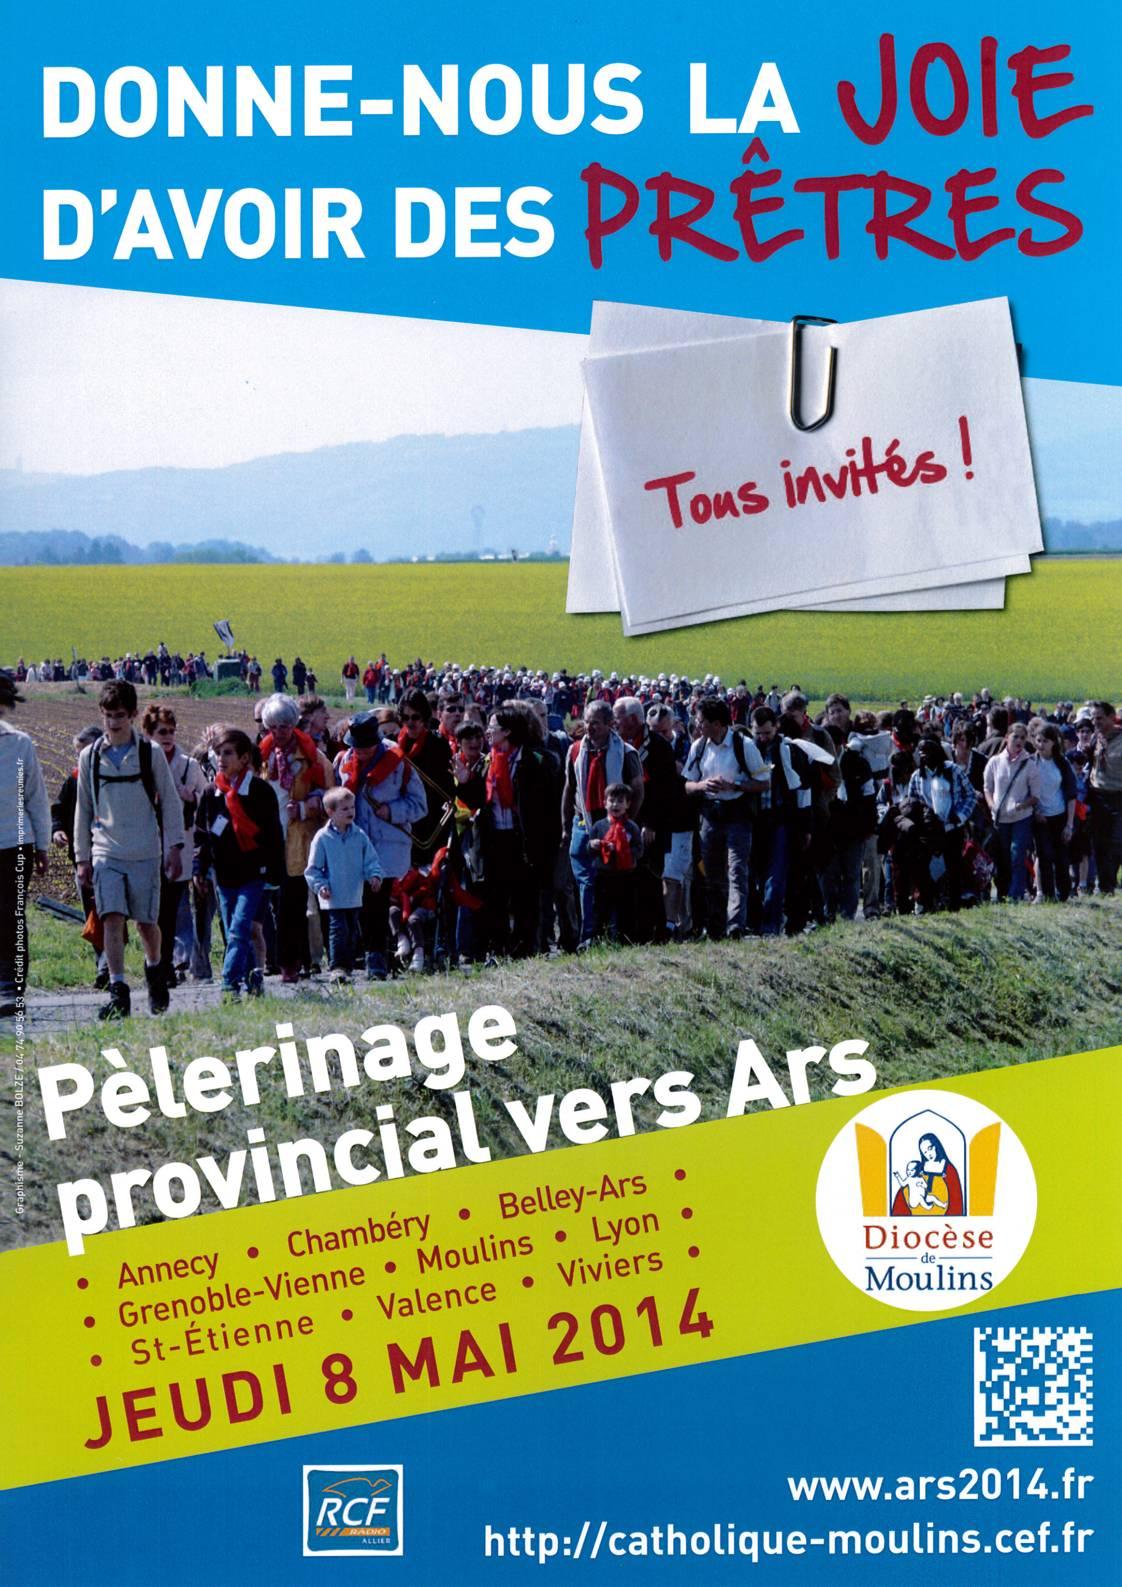 Pèlerinage provincial vers Ars